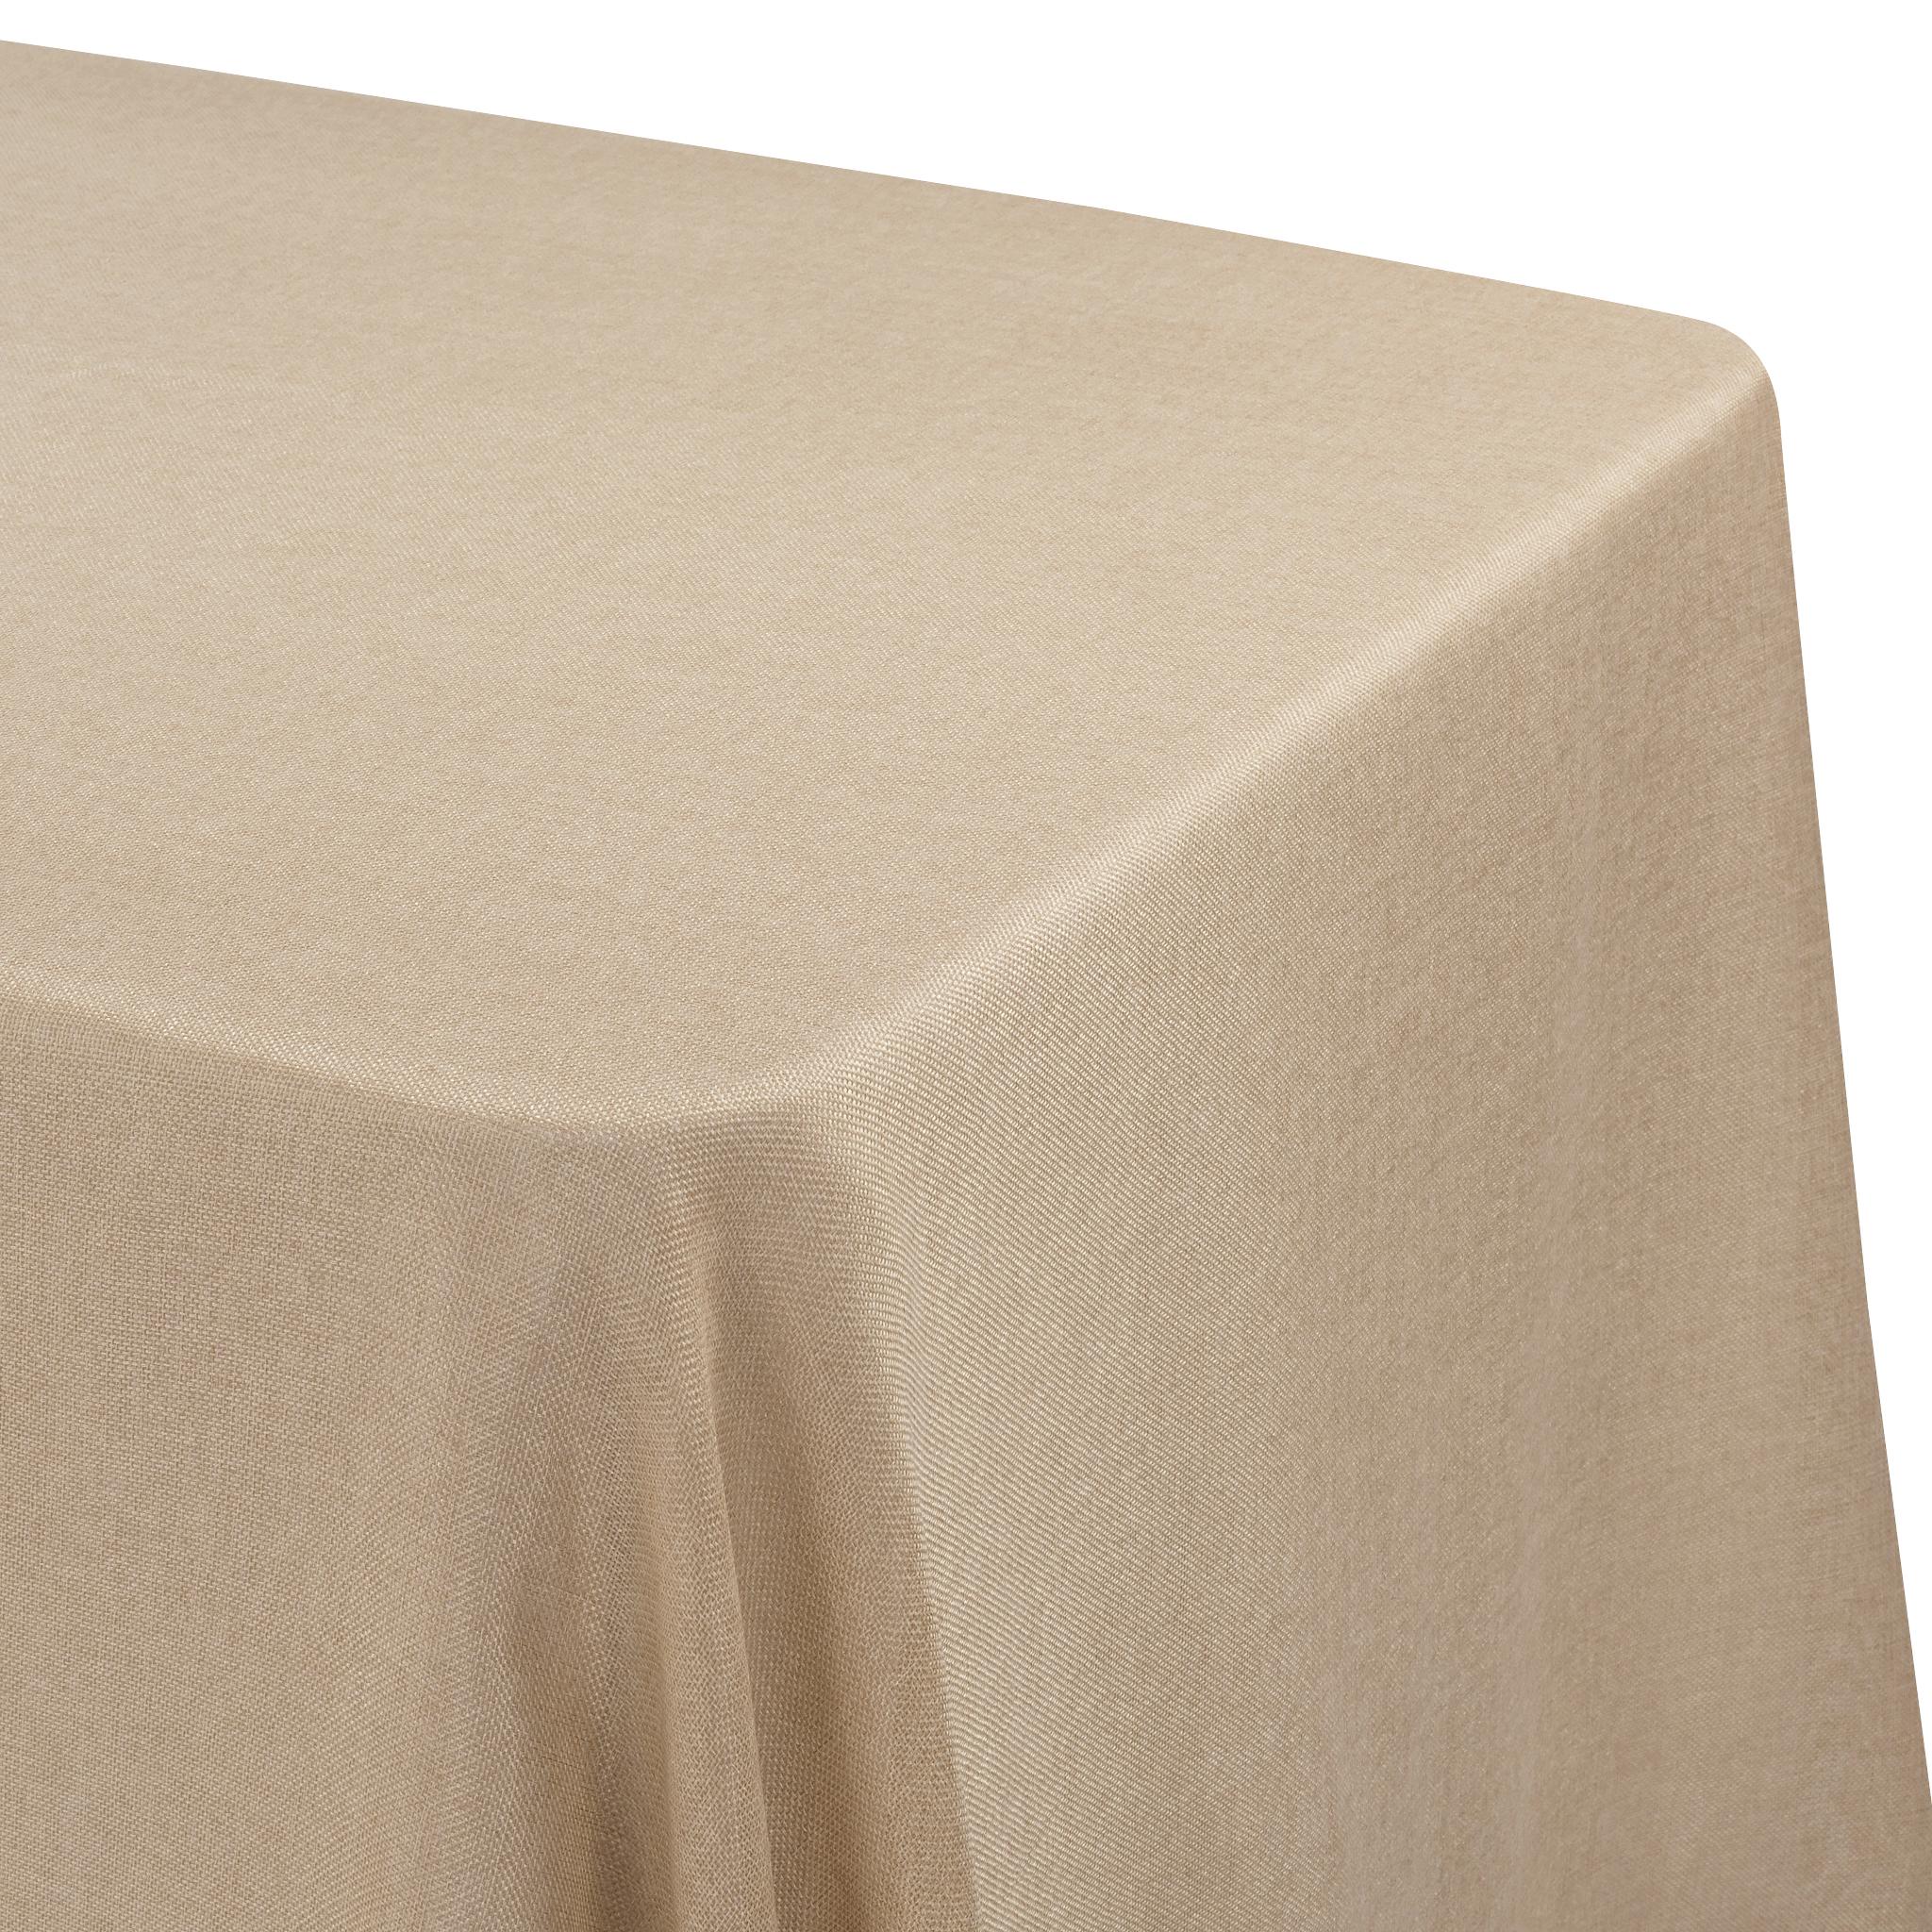 Faux Burlap Tablecloth 90 X156 Rectangular Blush Rose Gold